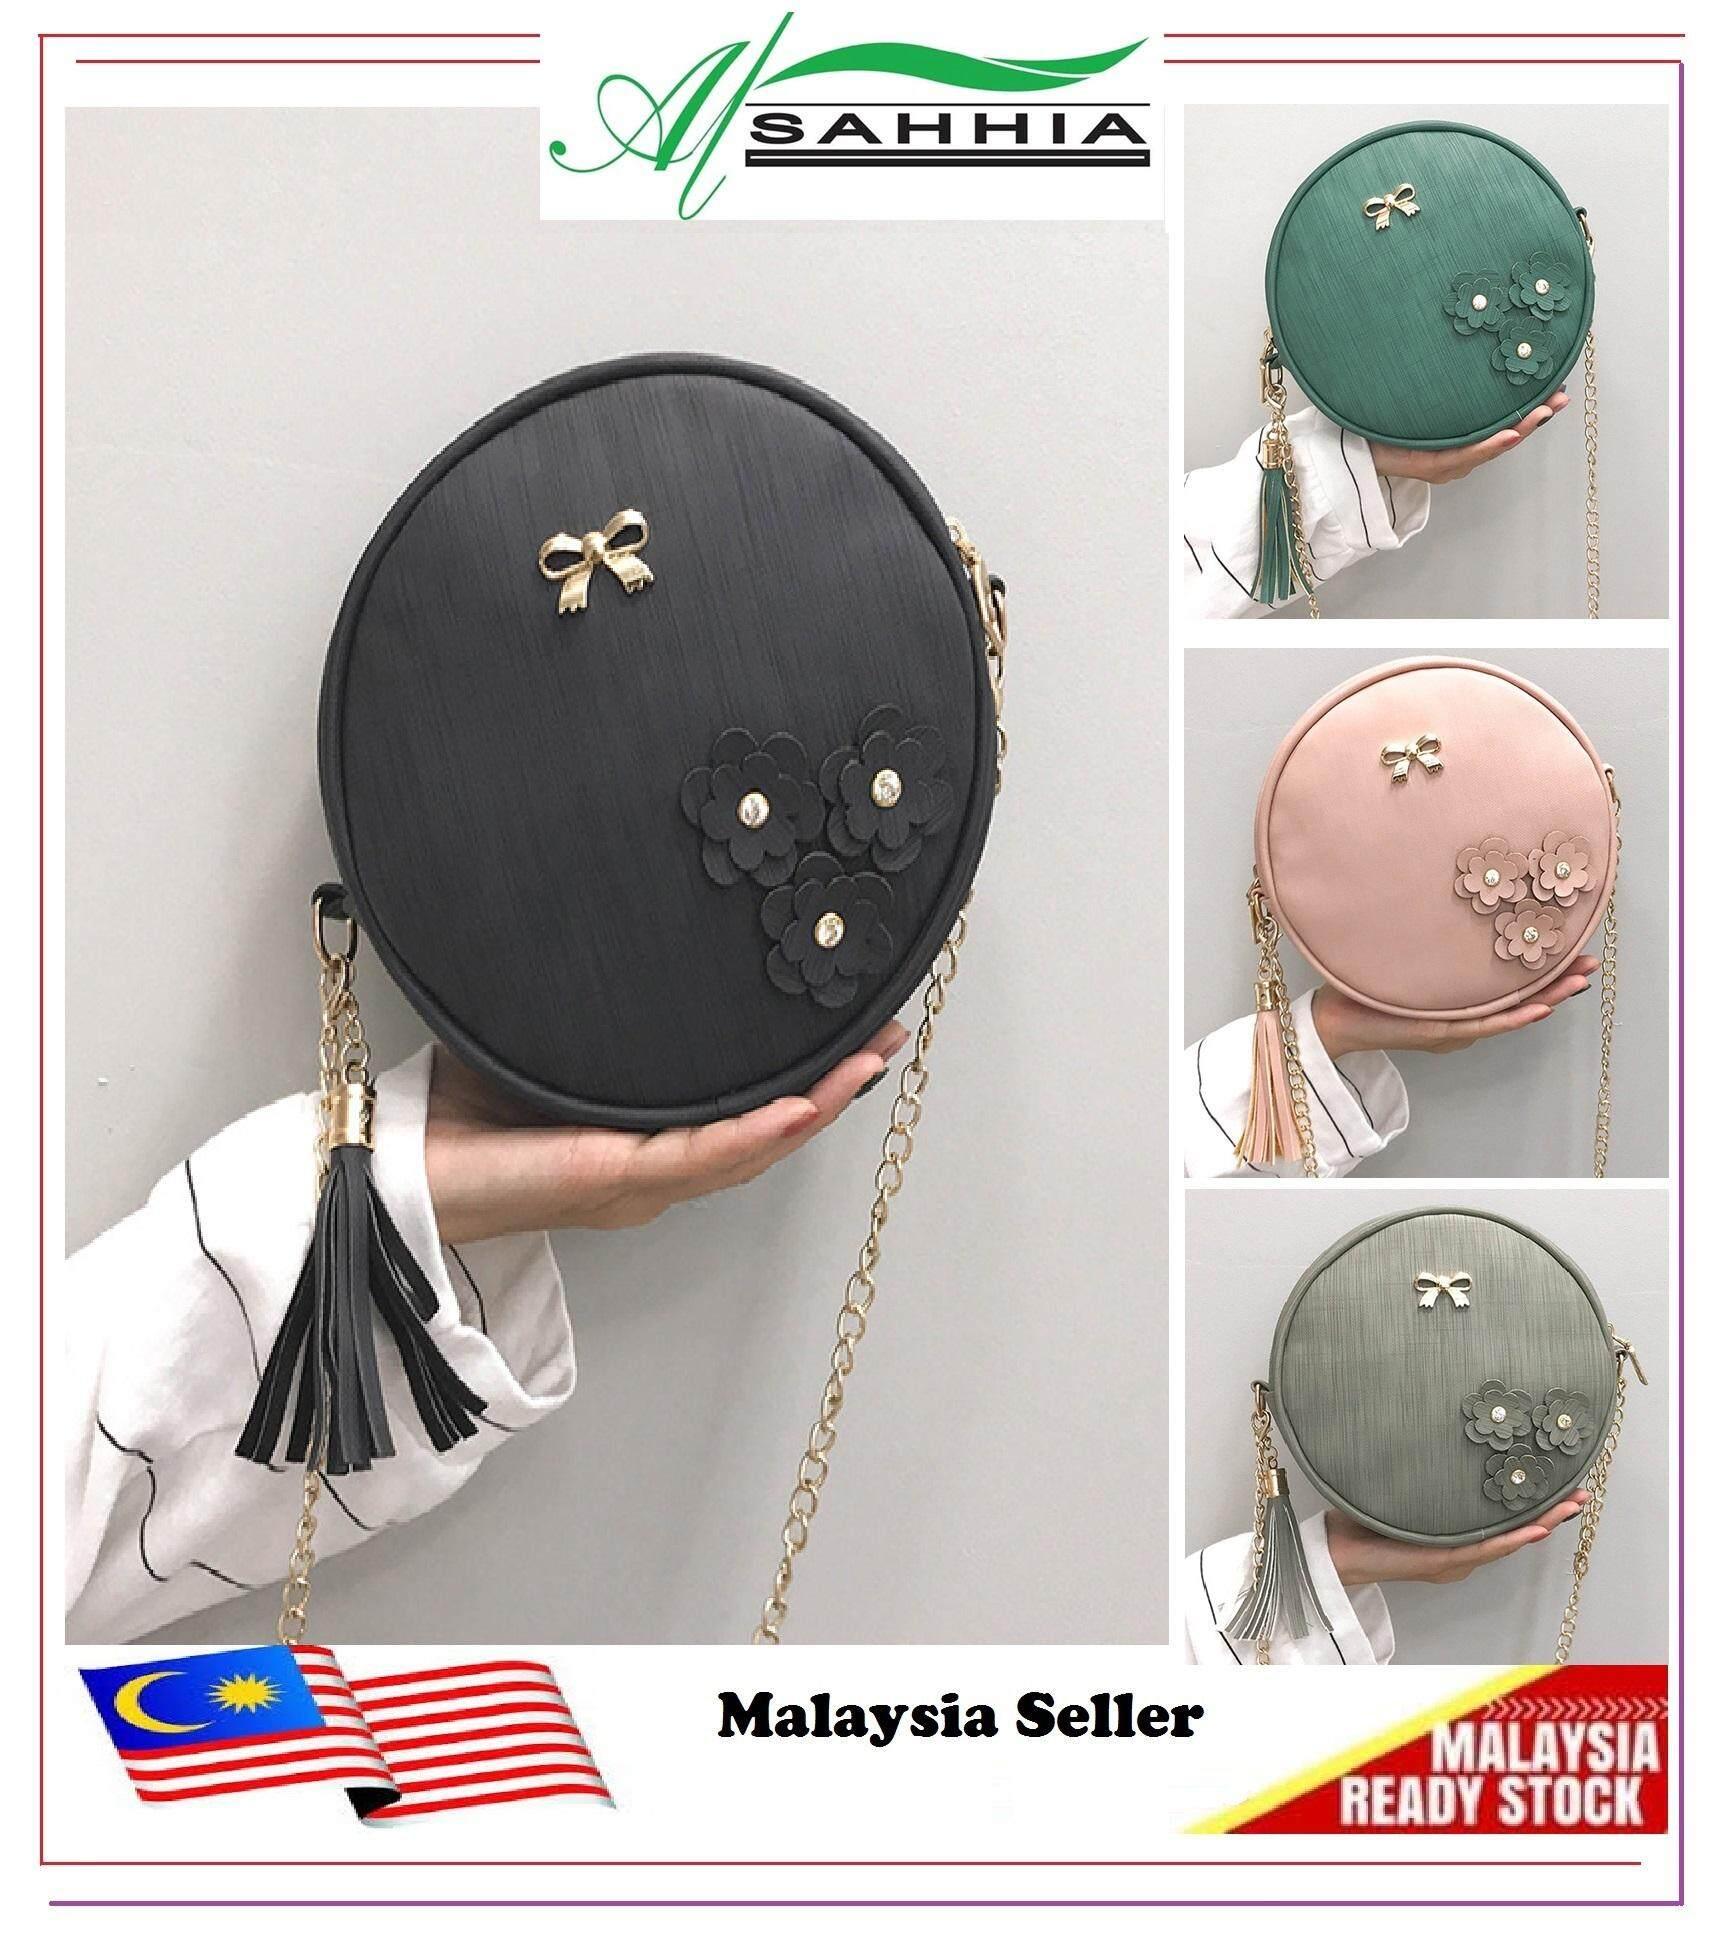 Al Sahhia Ready Stock Korean Ribbon 3 Flower Round Sling Bag Shoulder  Handbag 24b7dac4452c6